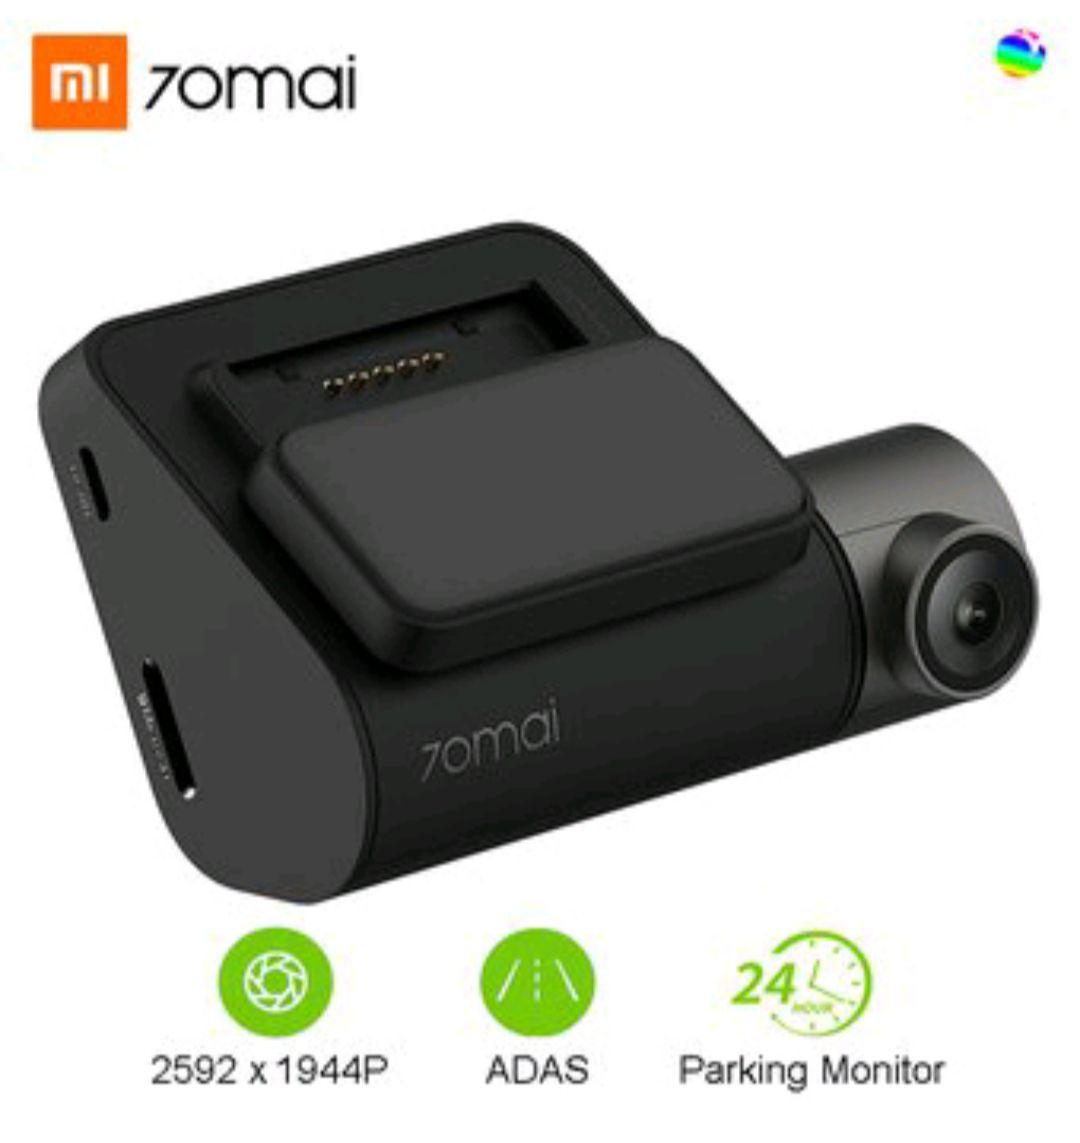 Linio: Xiaomi 70mai PRO Dash Cam 1944P GPS